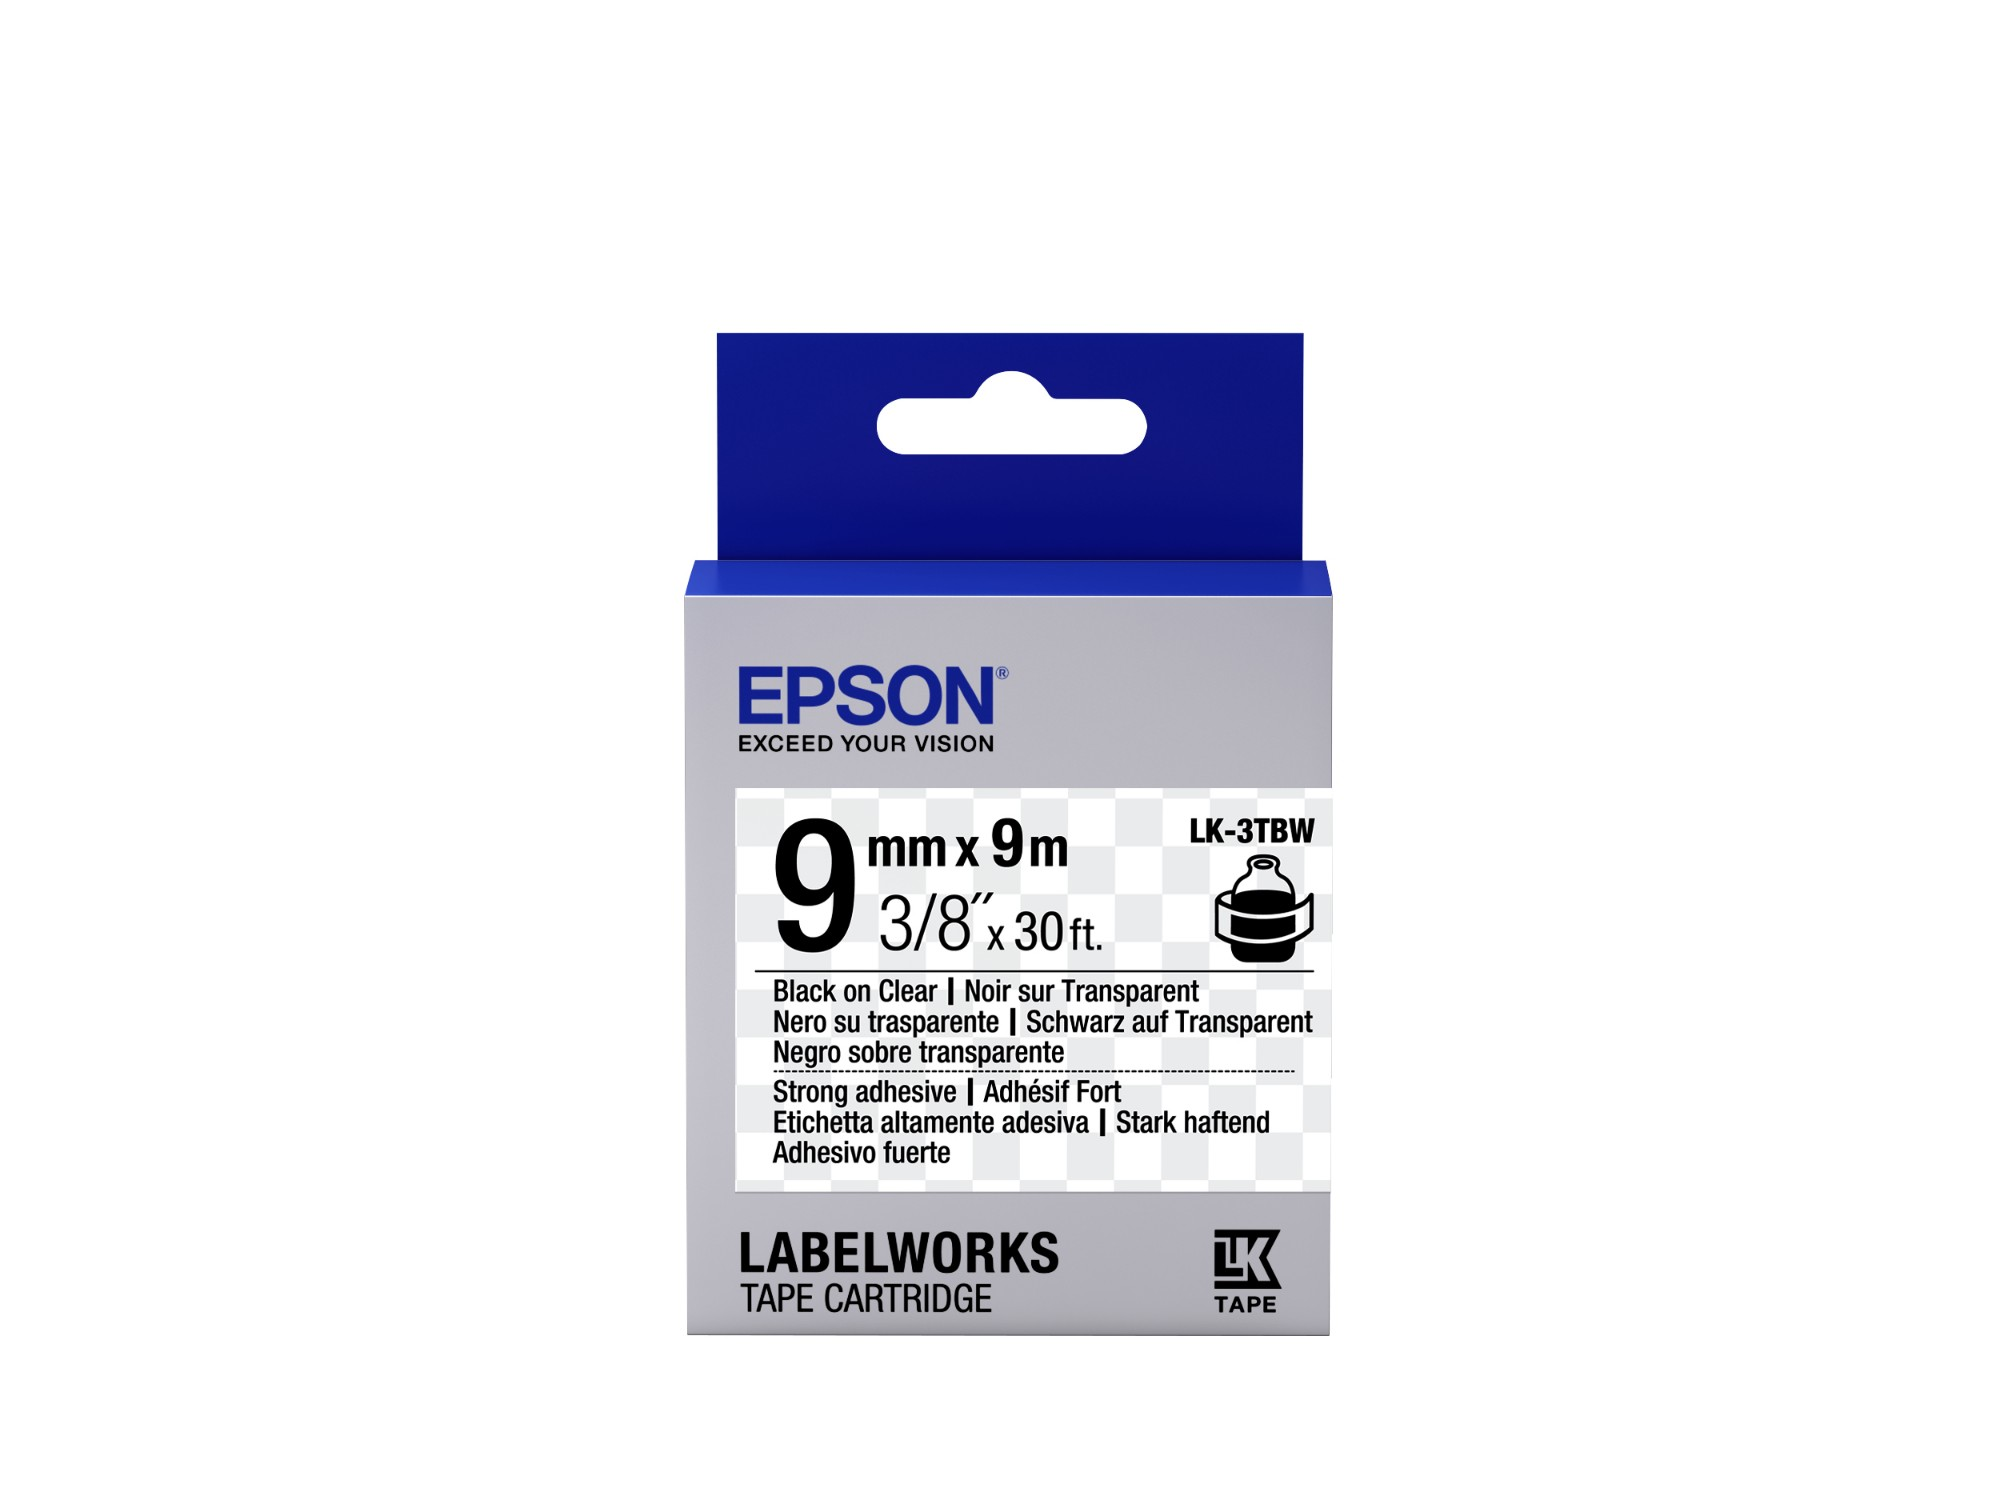 Epson C53S653006 (LK-3TBW) Ribbon, 9mm x 9m